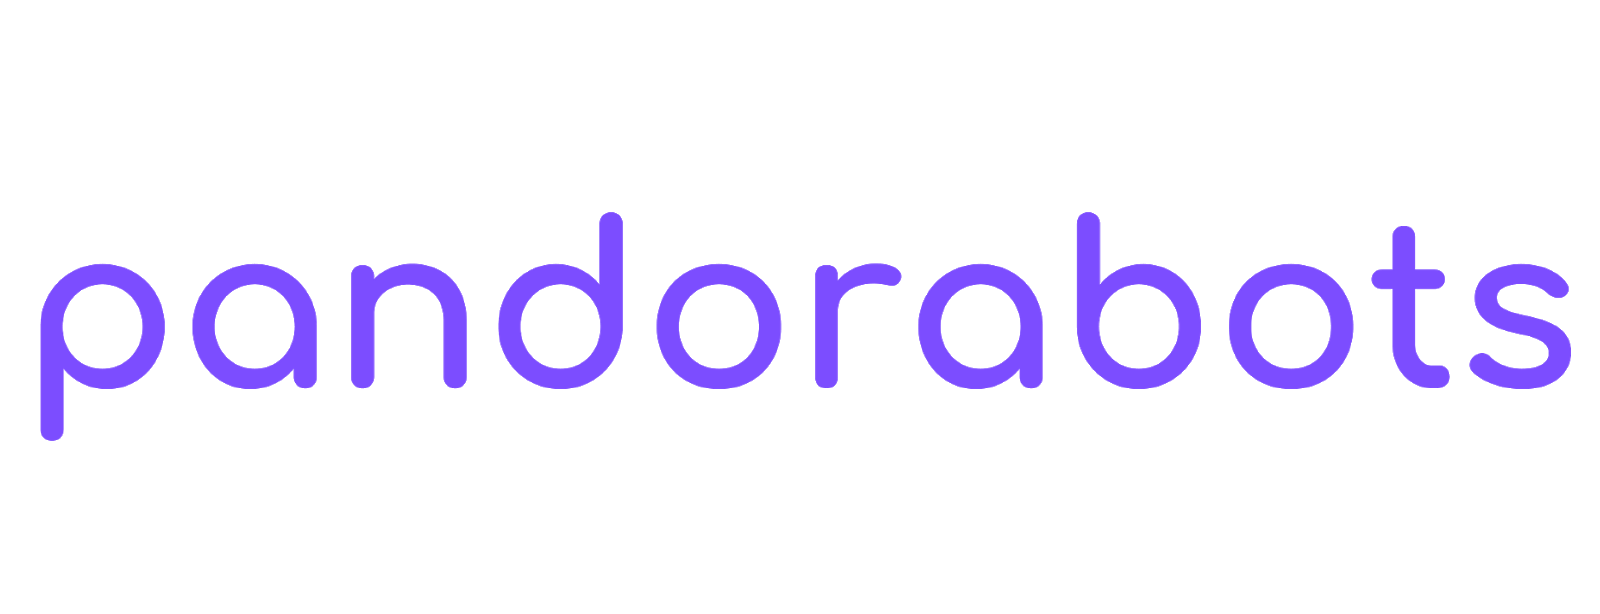 Pandorabots logo